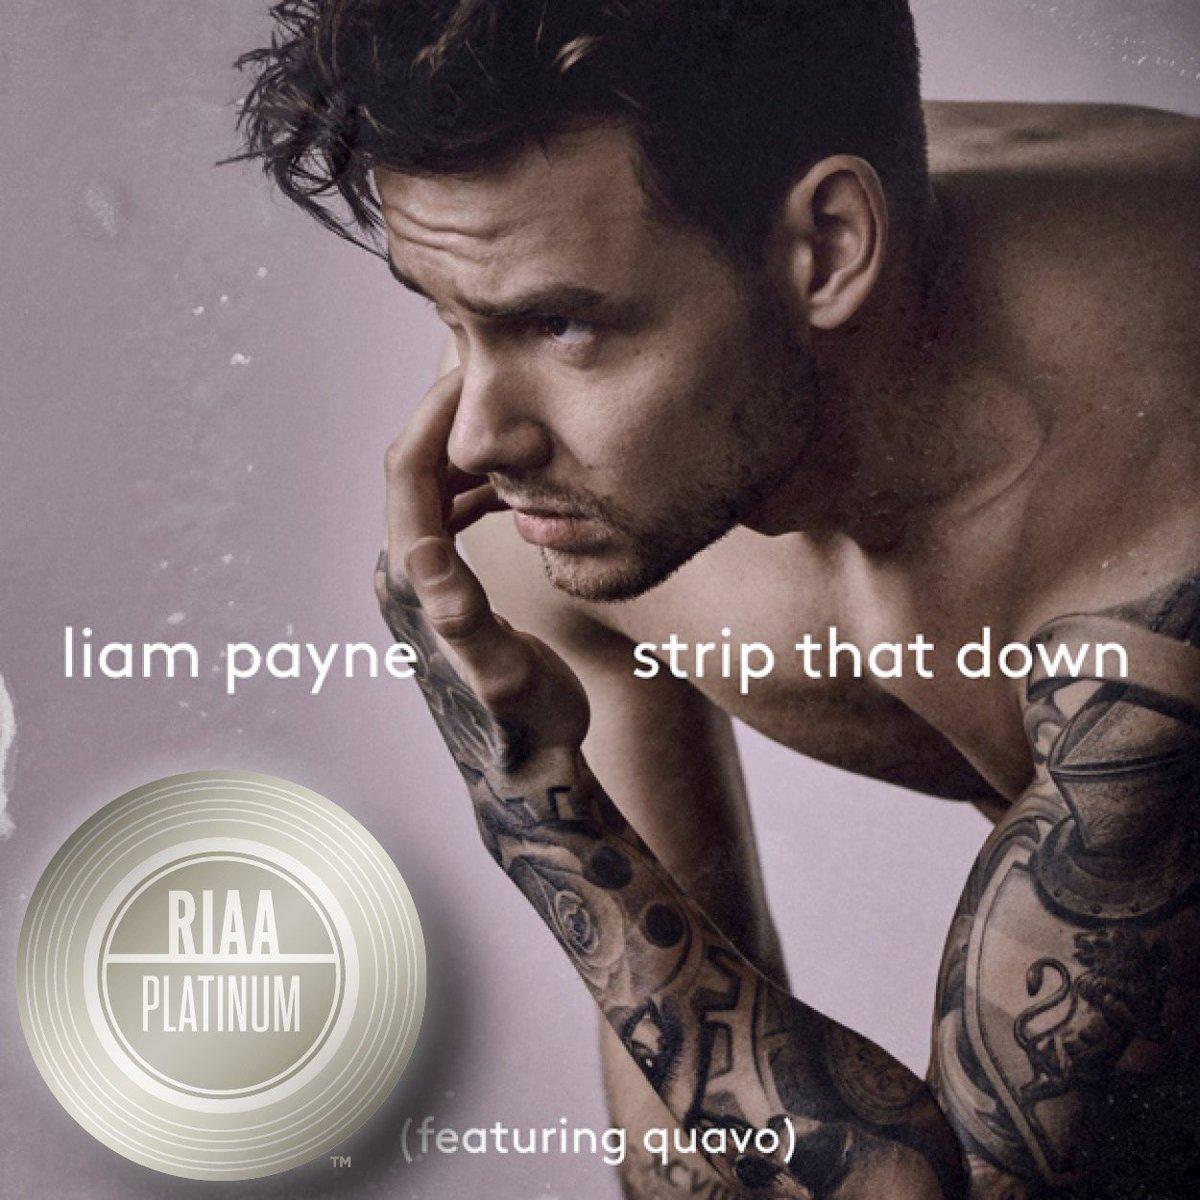 Platinum in three months! Congratulations @LiamPayne #StripItDown! @RepublicRecords